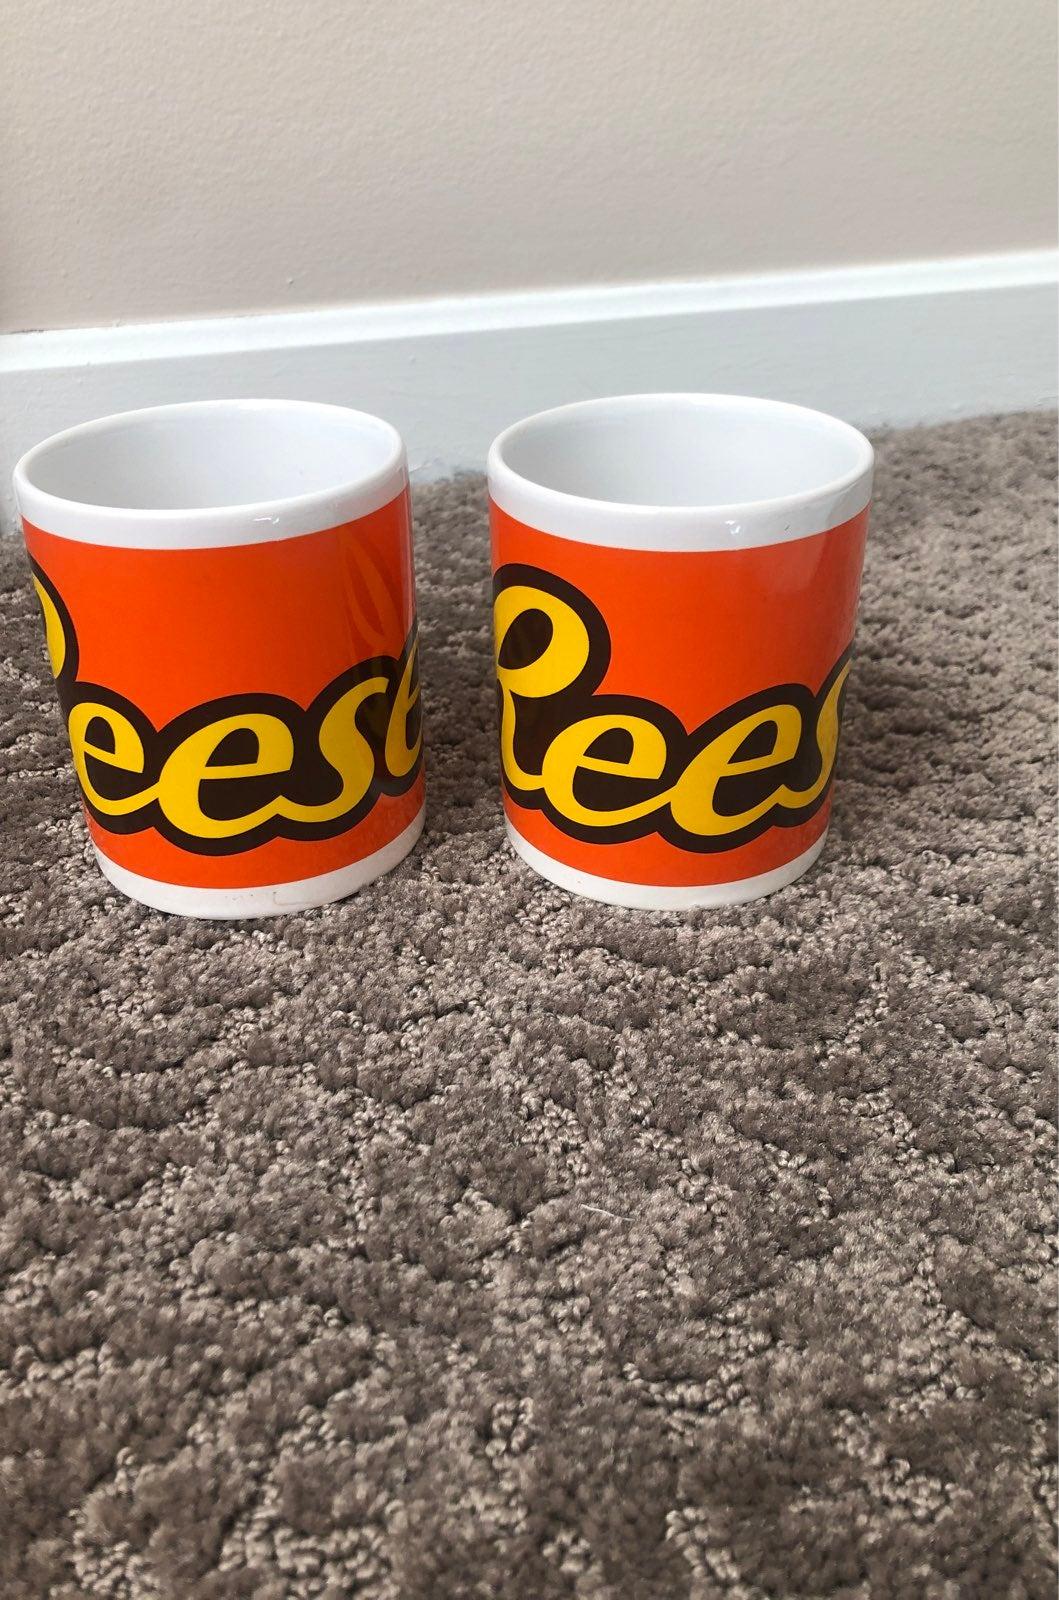 Reese's coffee mugs